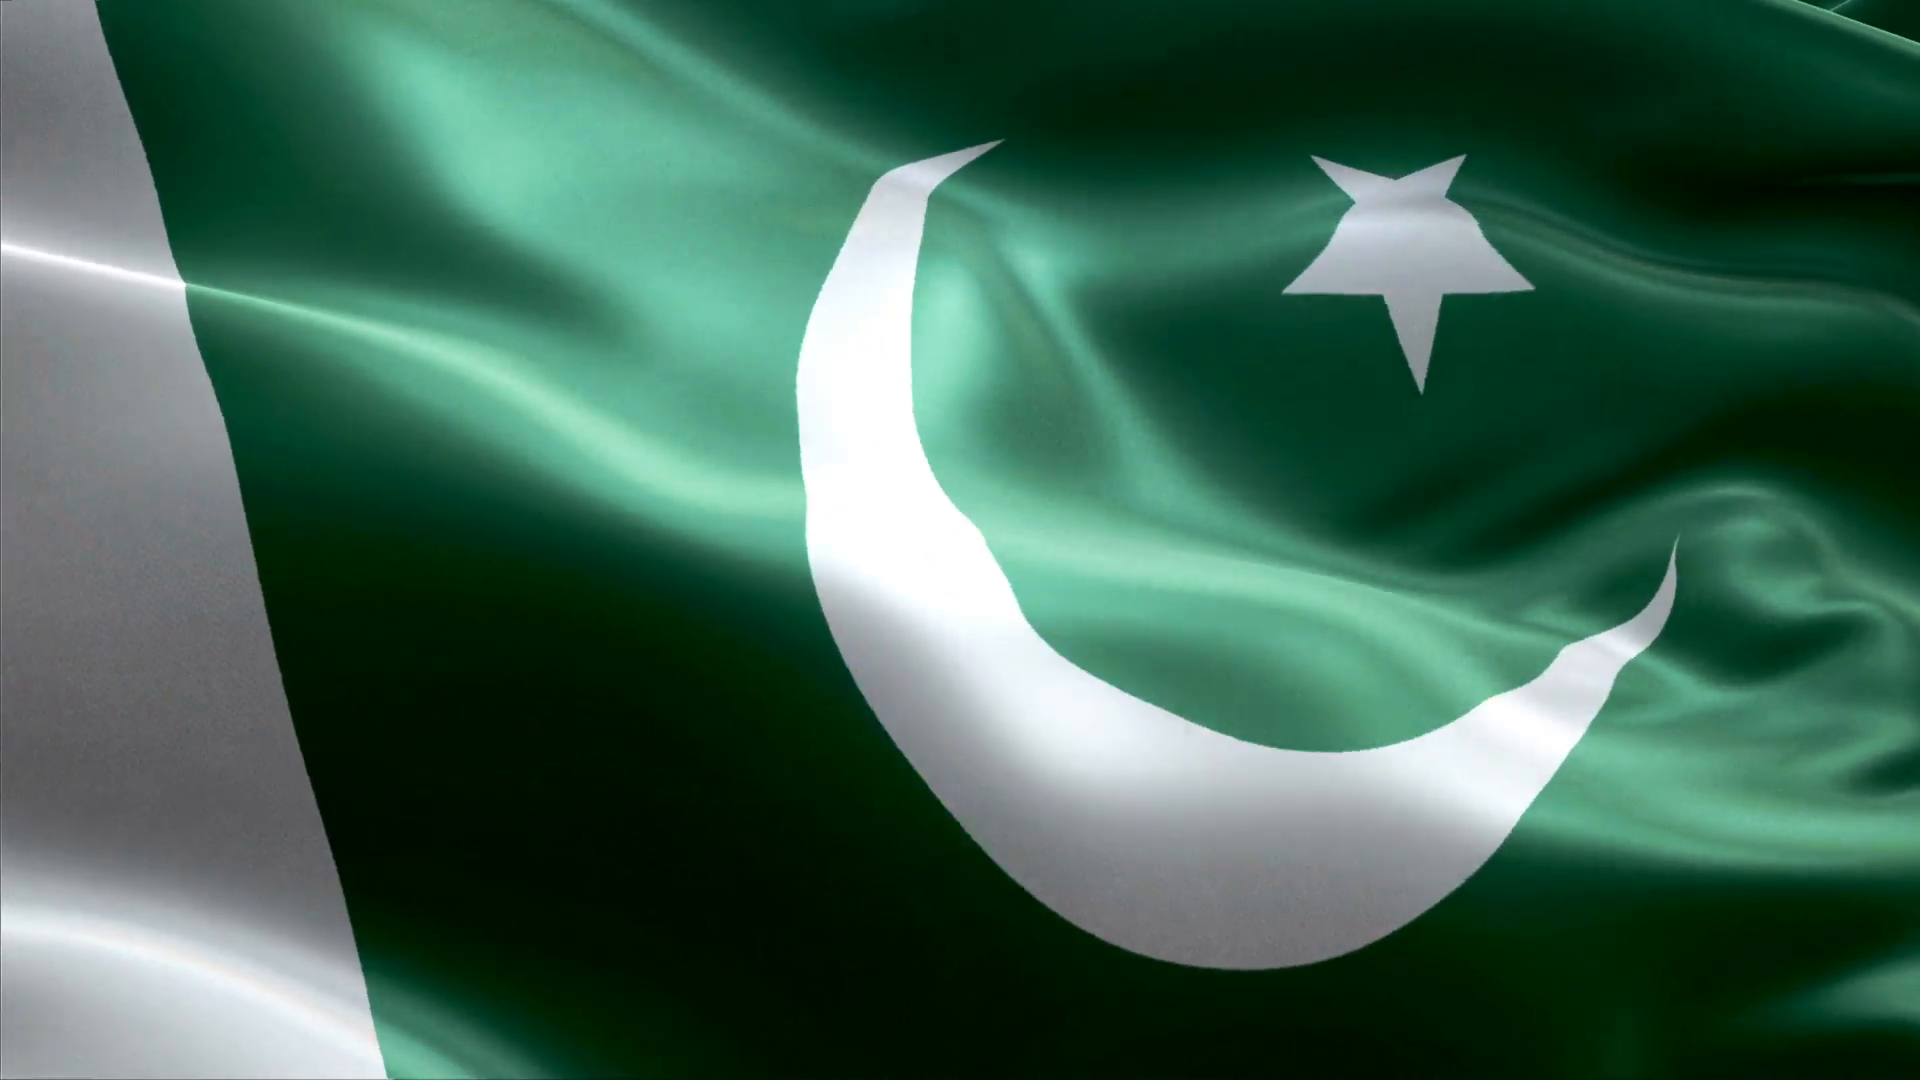 Pakistan Flag Wallpaper 3